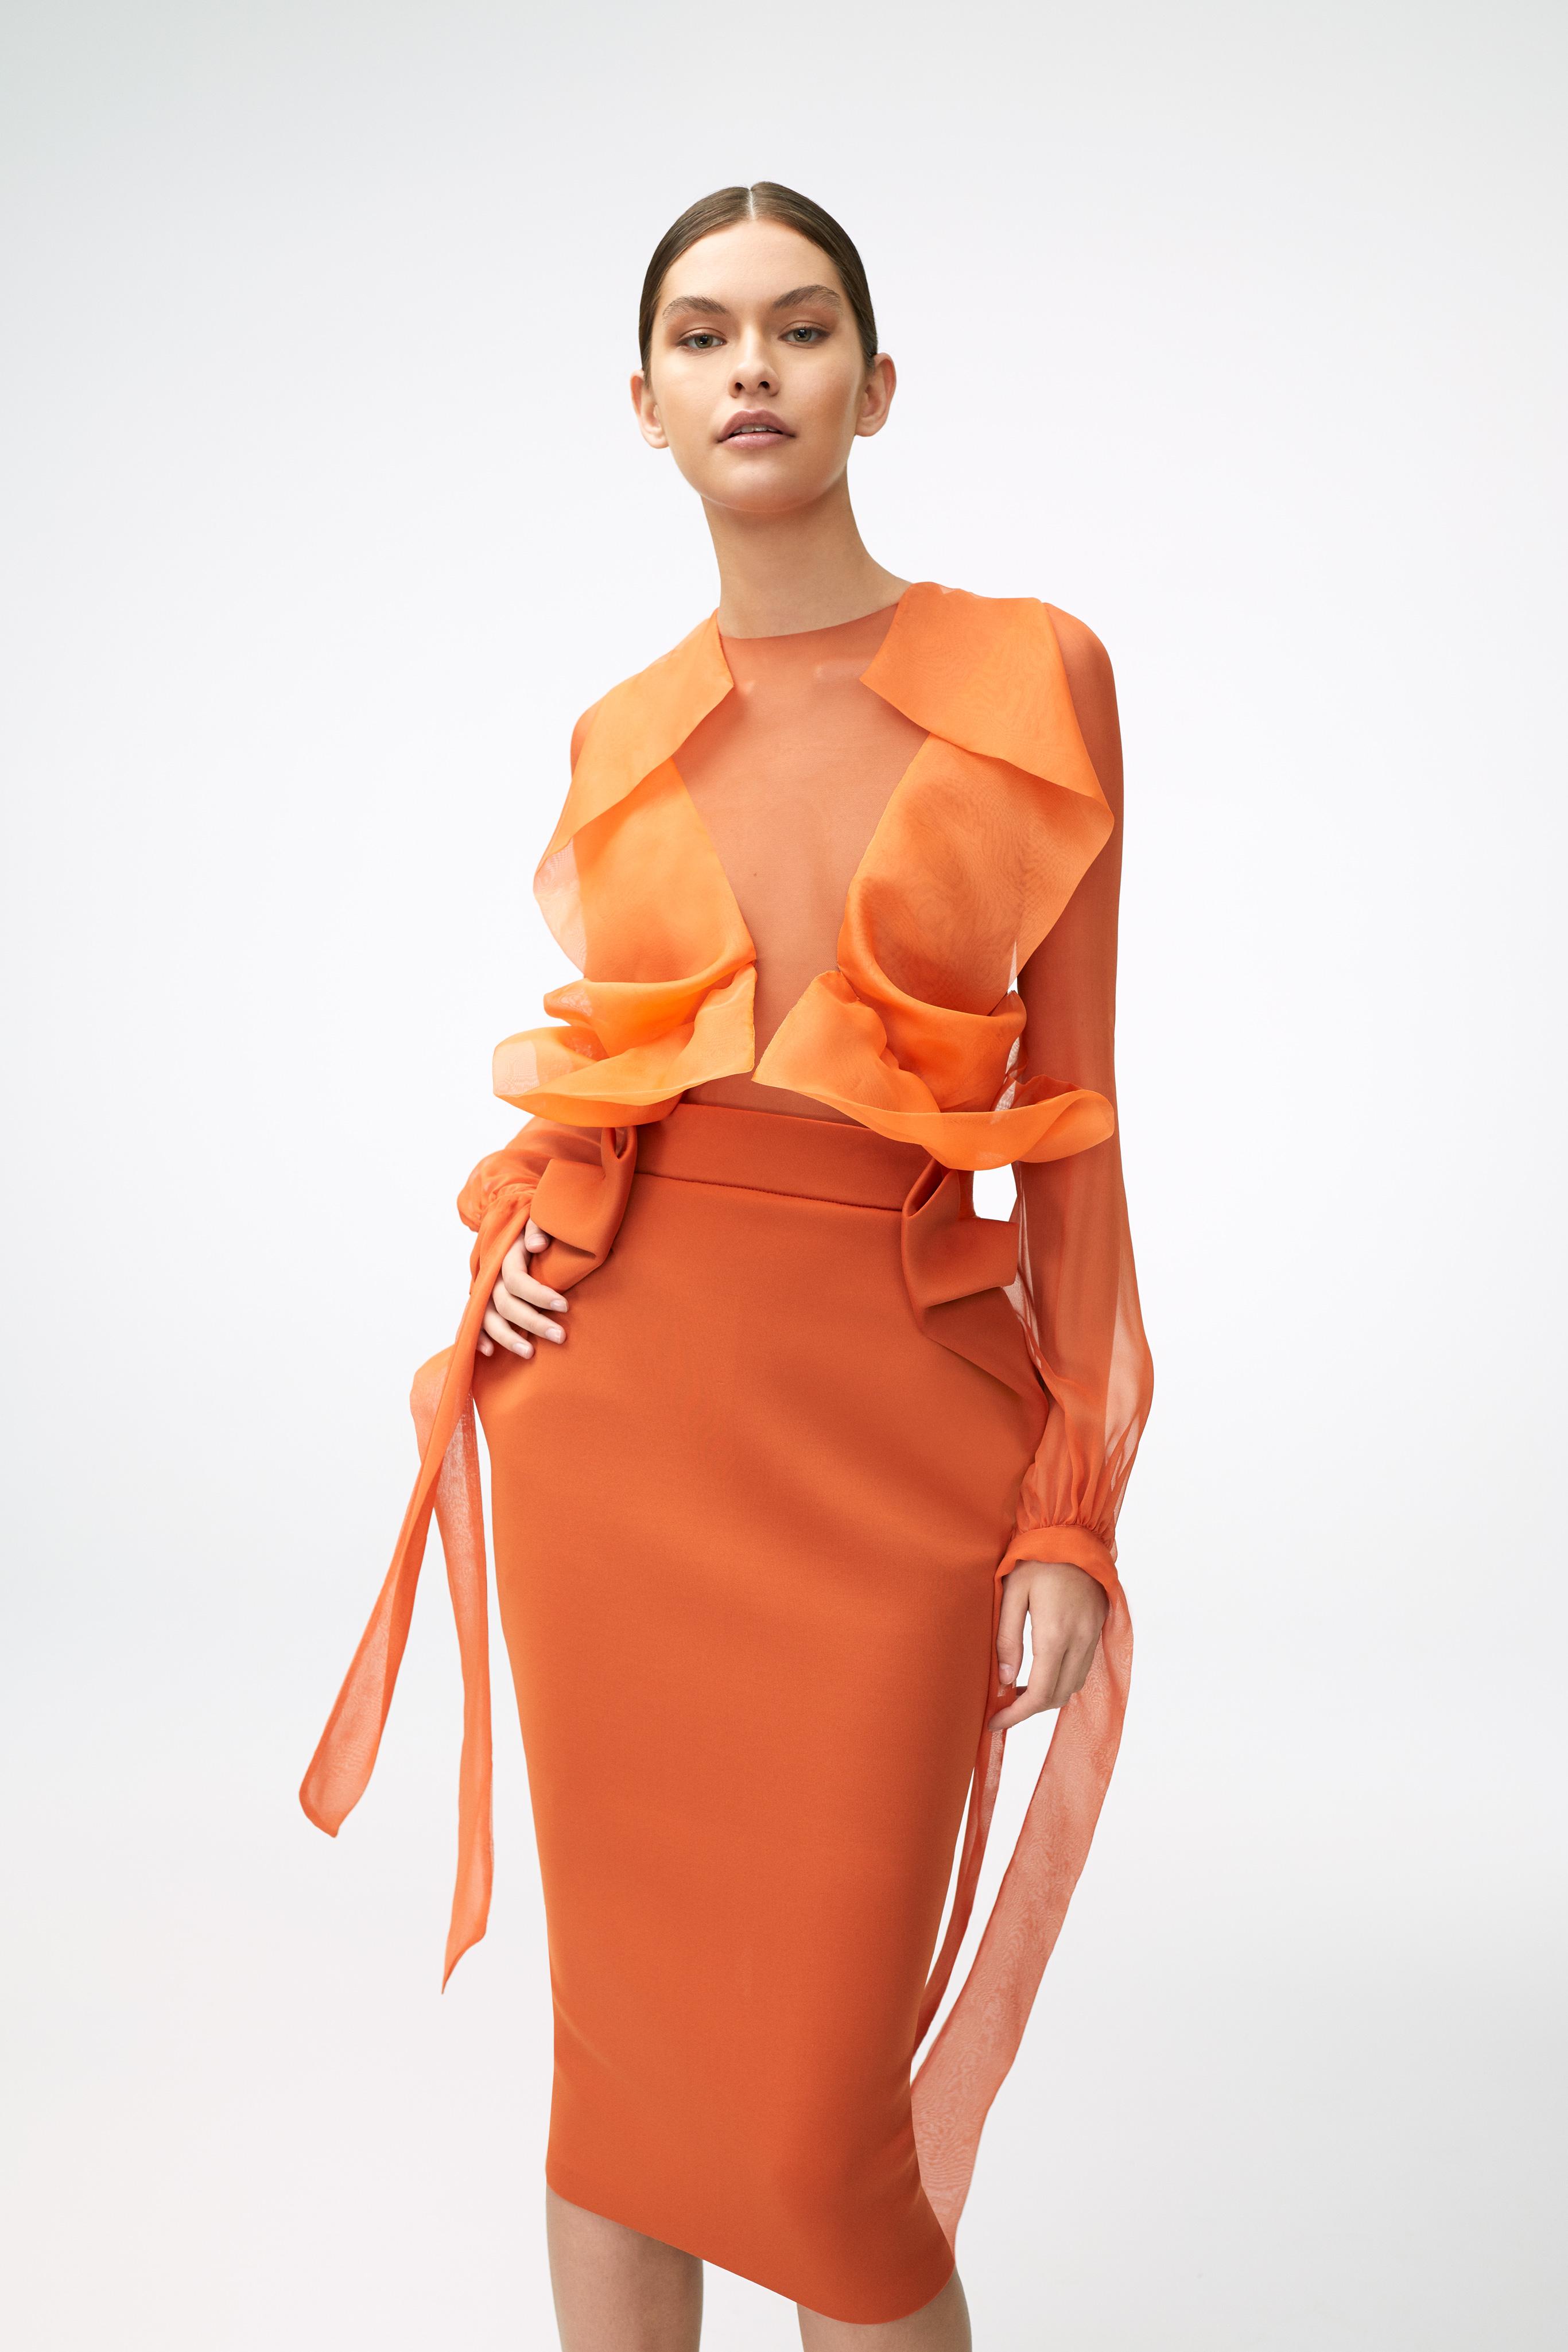 Butterfly Blouse and Delta Skirt SS2021 Image: Amanda Pratt Styling: Dimeji Alara